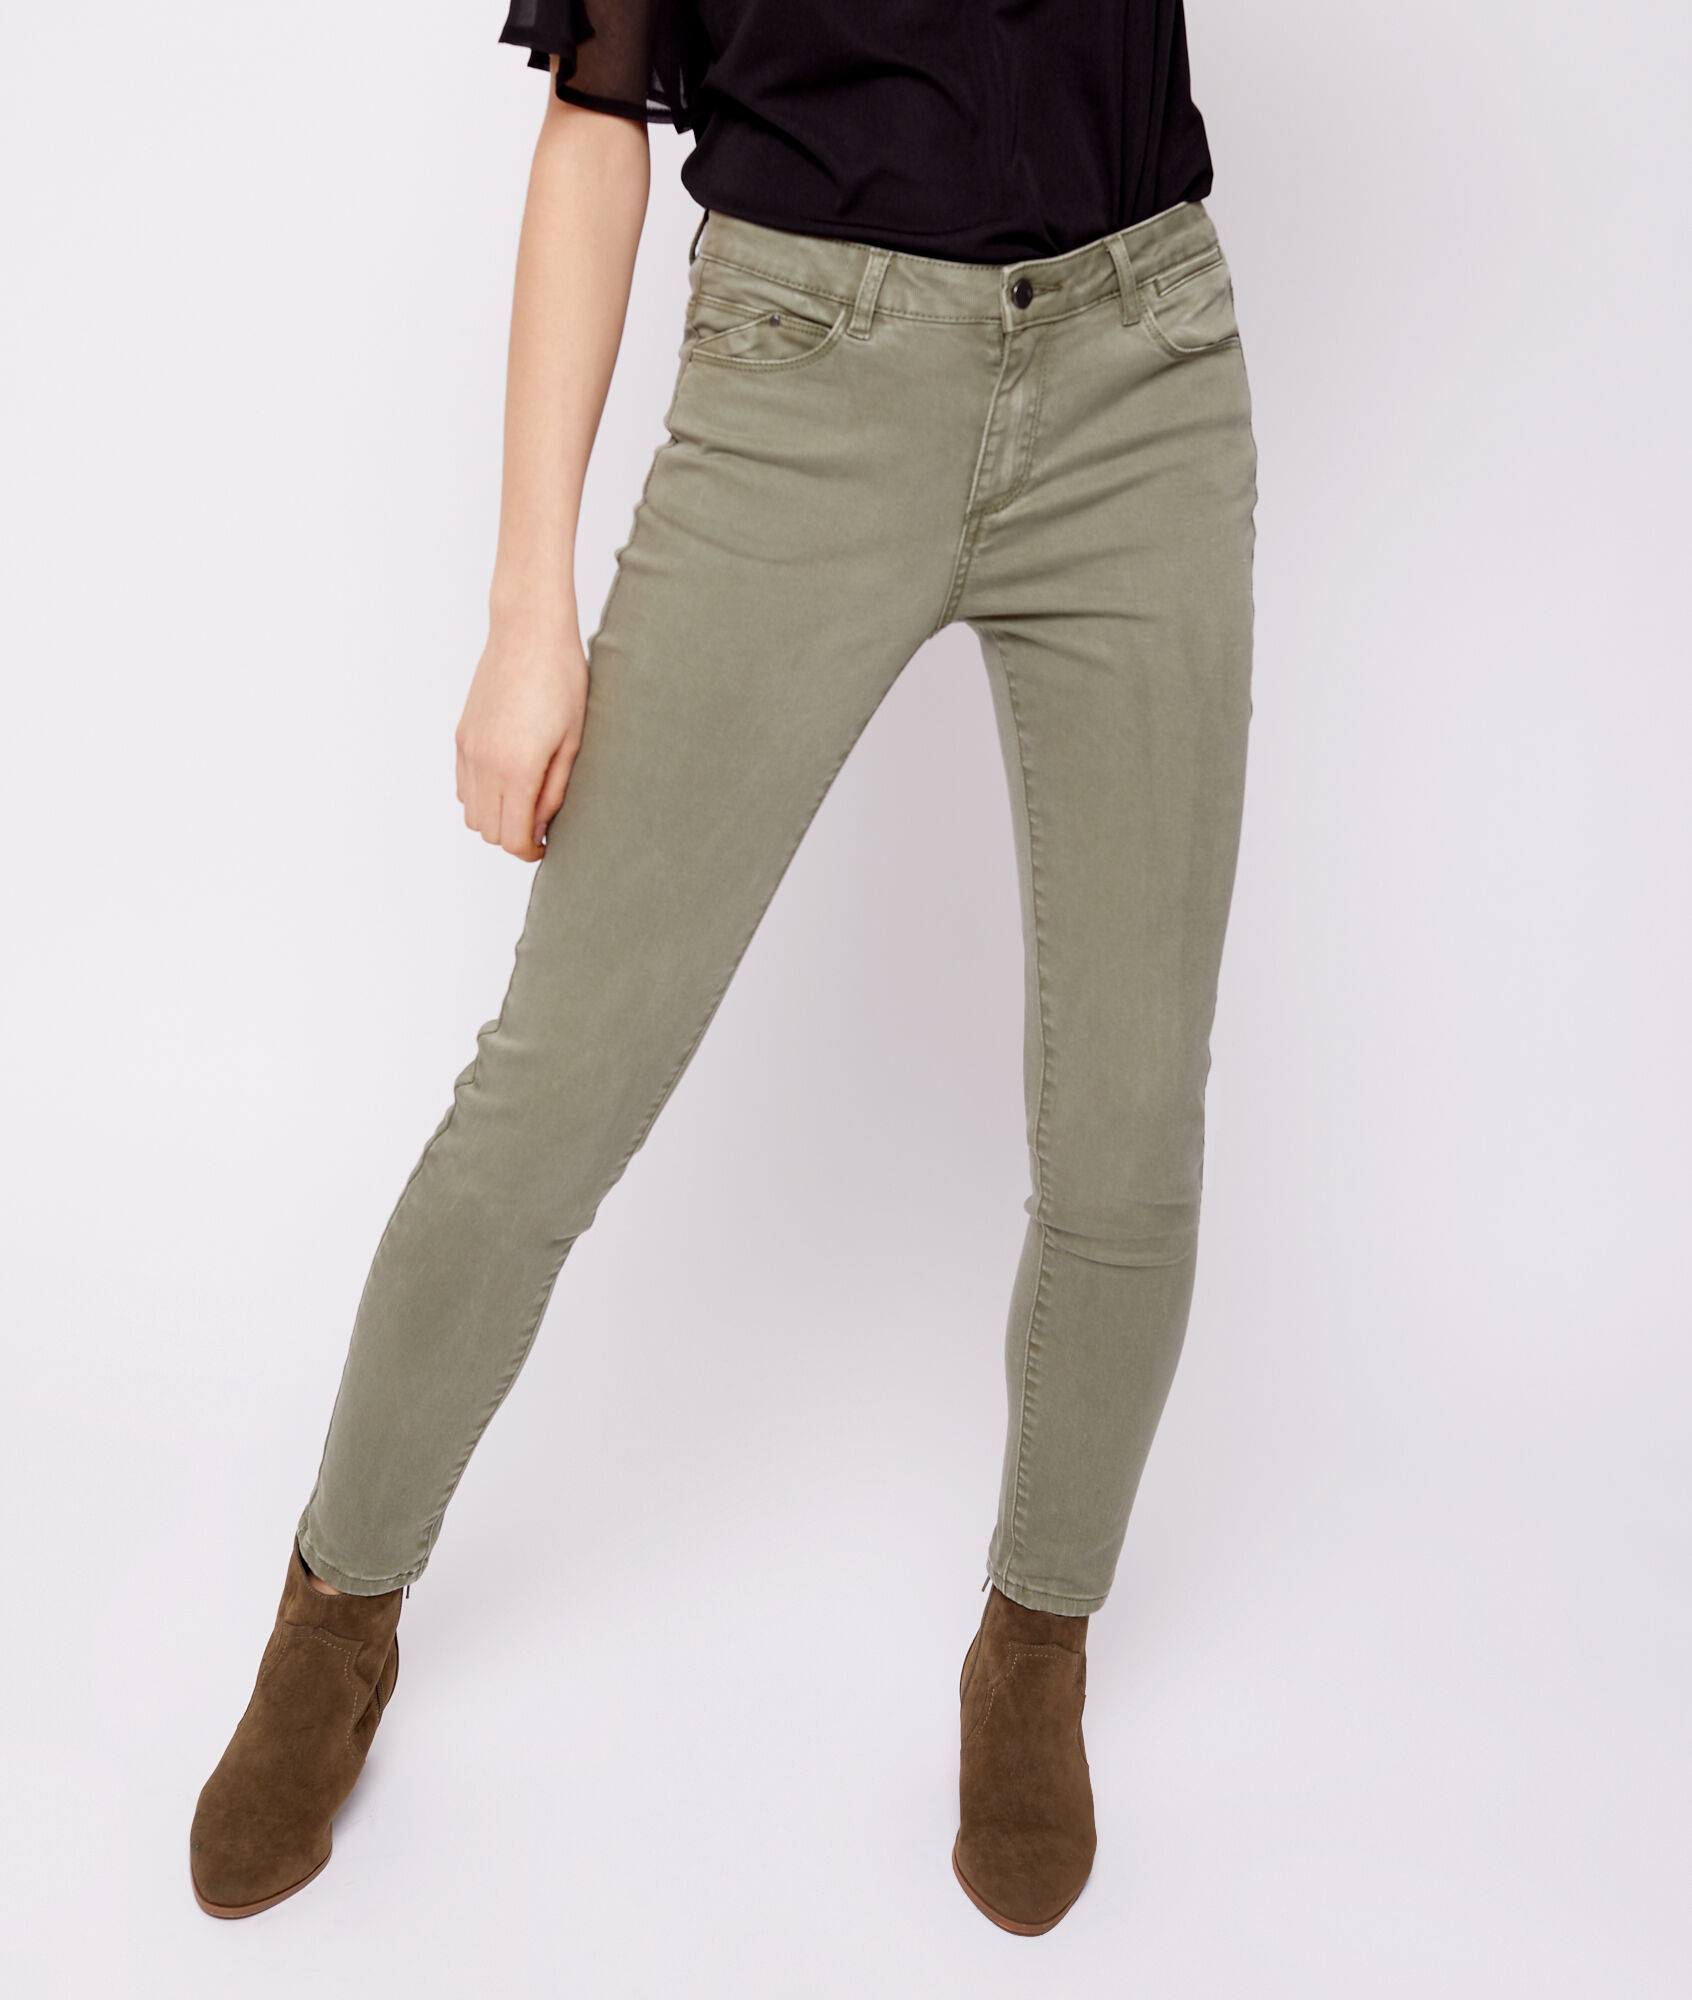 Mujer Vaqueros Pantalones Etam Moda Online De BqOqwvxY 1b0a16645456